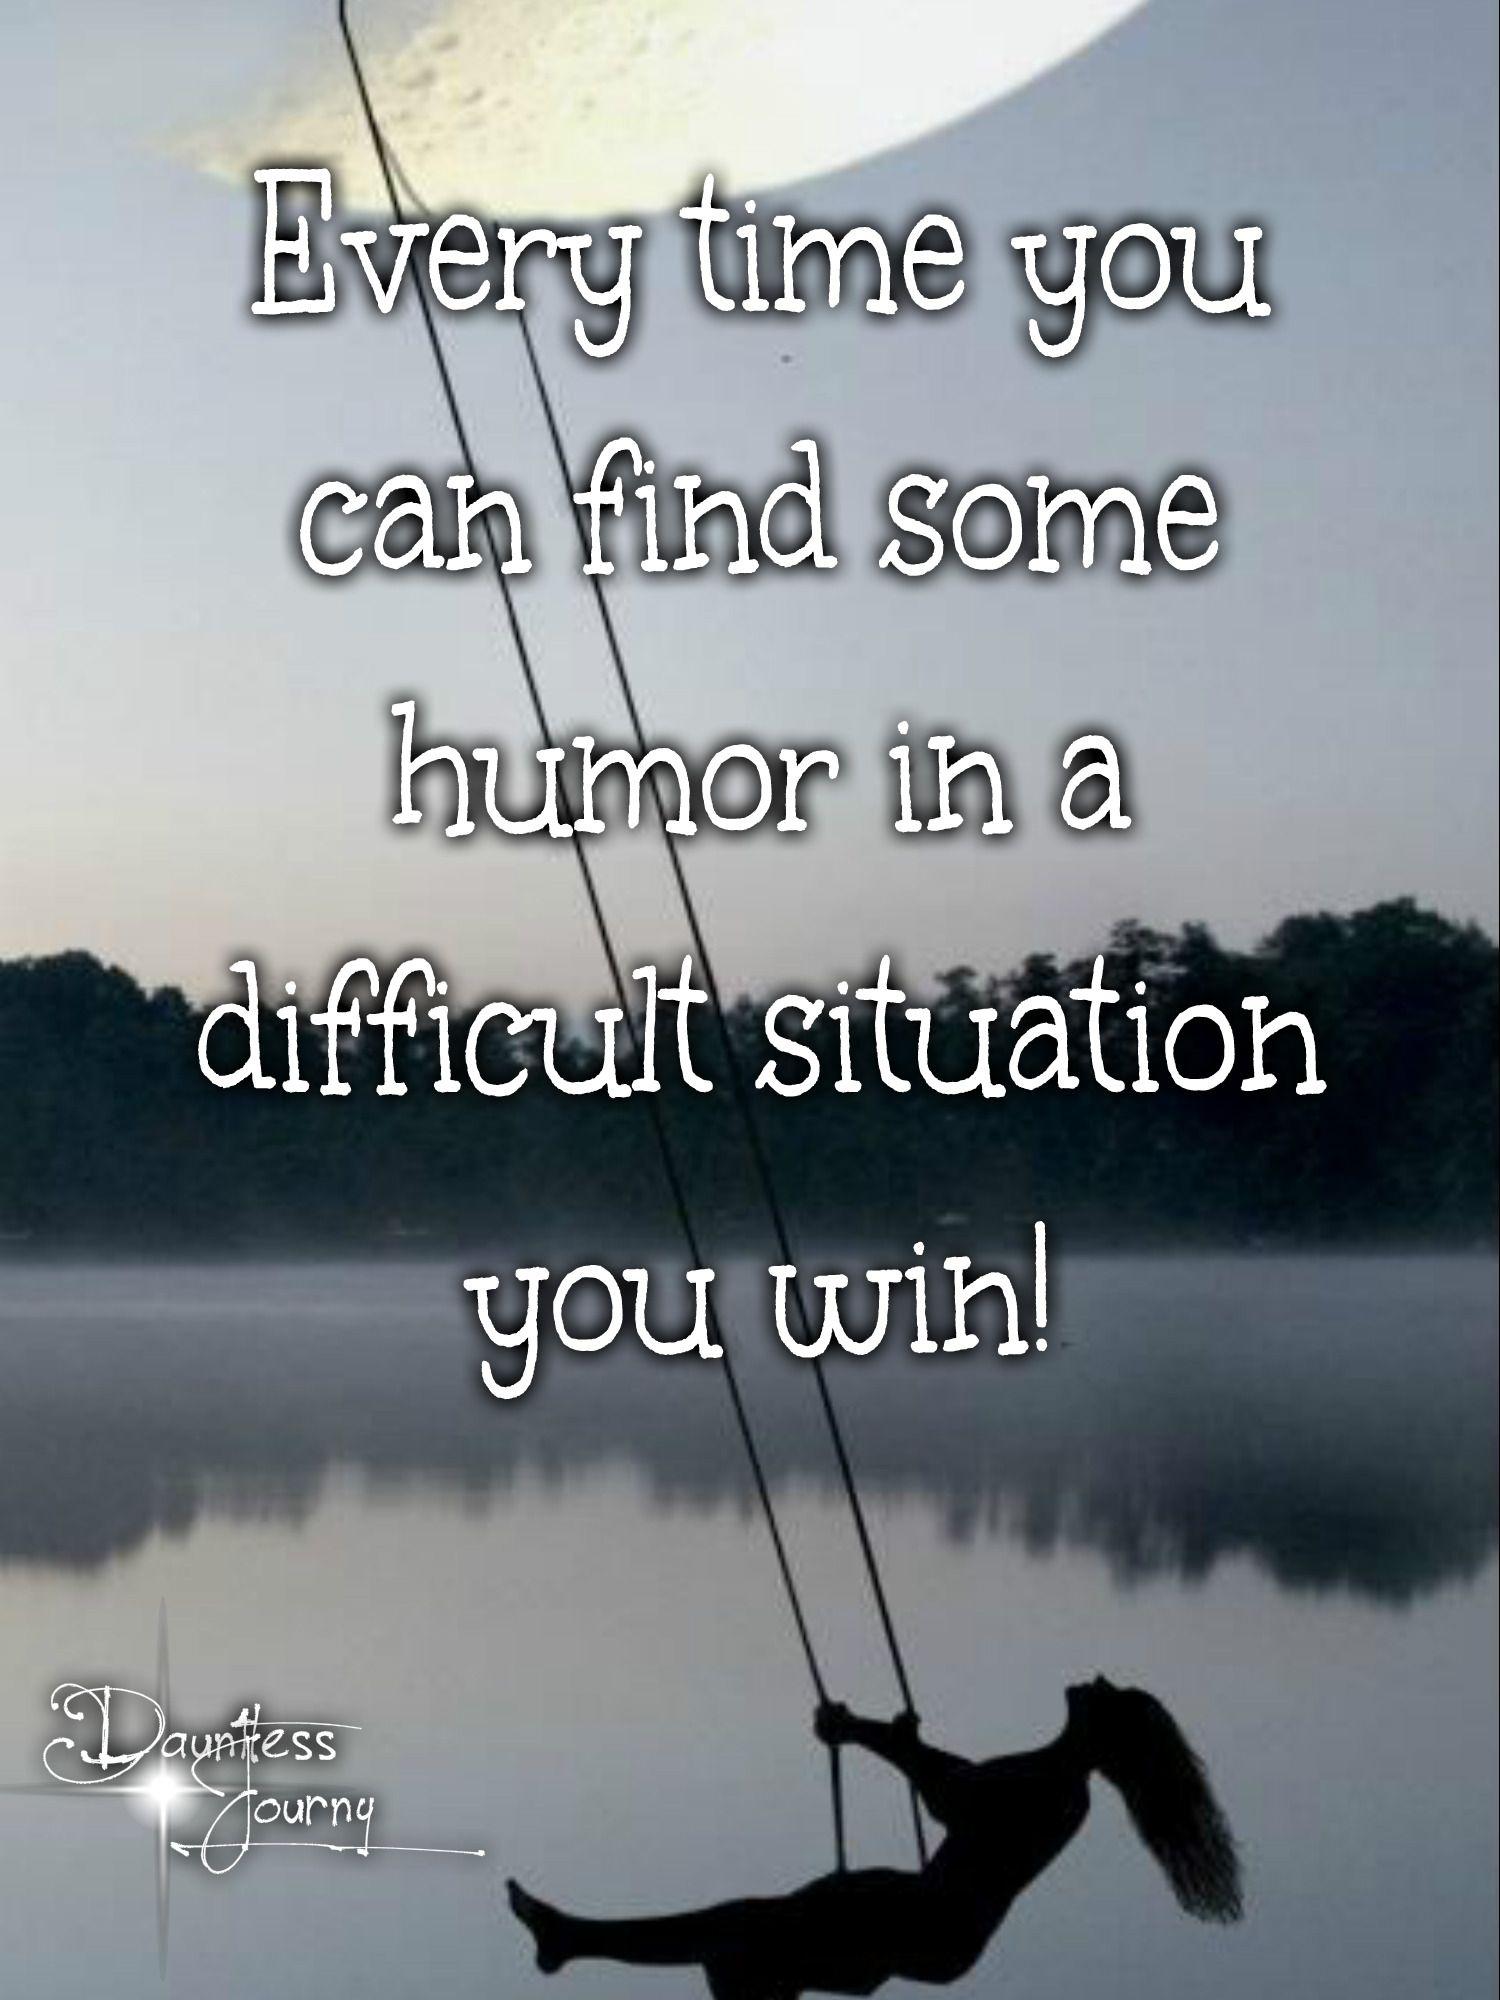 Life Wisdom Quotes Pinsherri Renne On Inspirational Wisdom Quotes  Pinterest